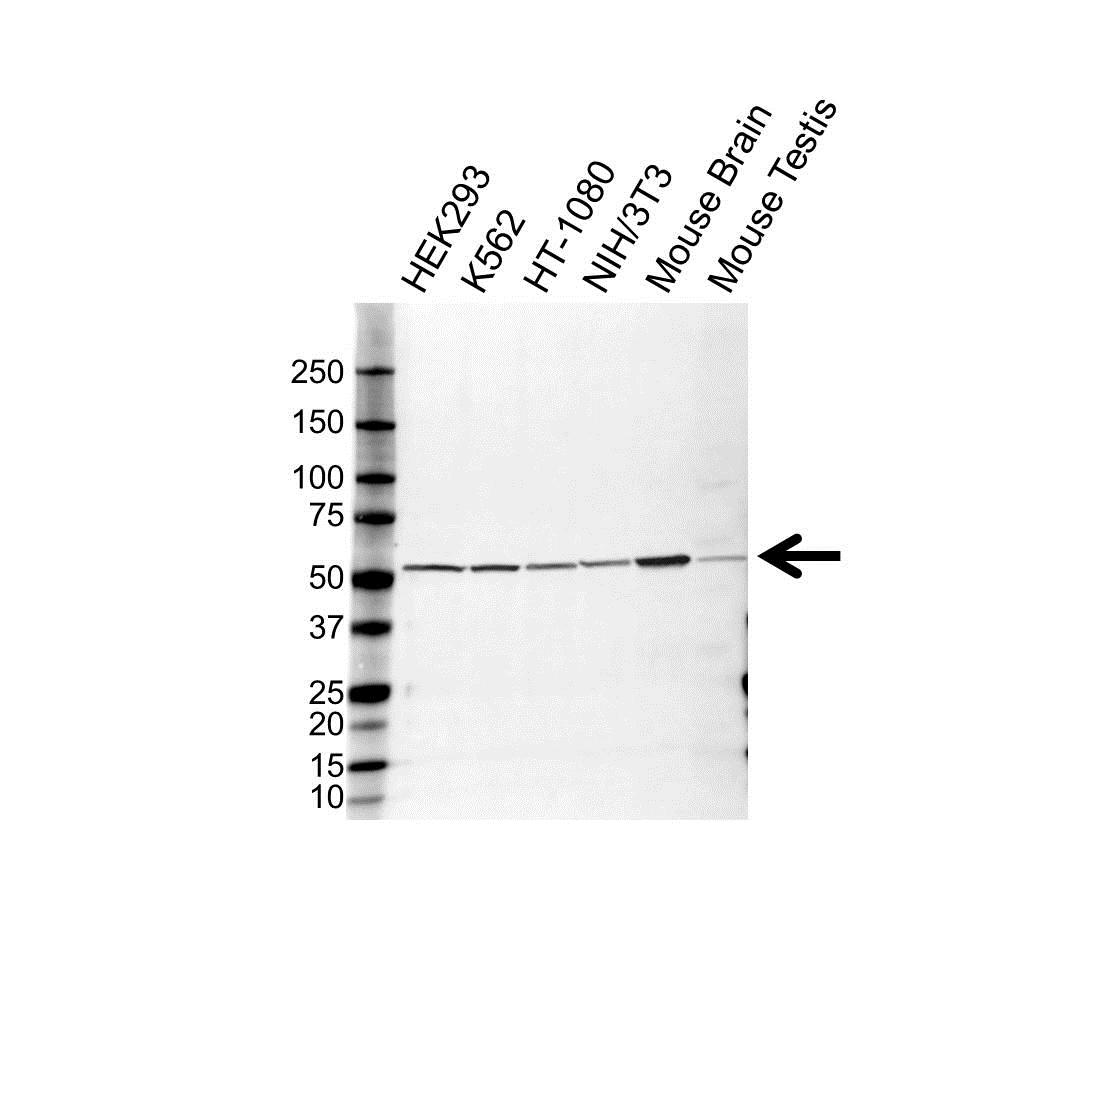 Anti Tubulin Alpha 1C Chain Antibody (PrecisionAb Polyclonal Antibody) gallery image 1